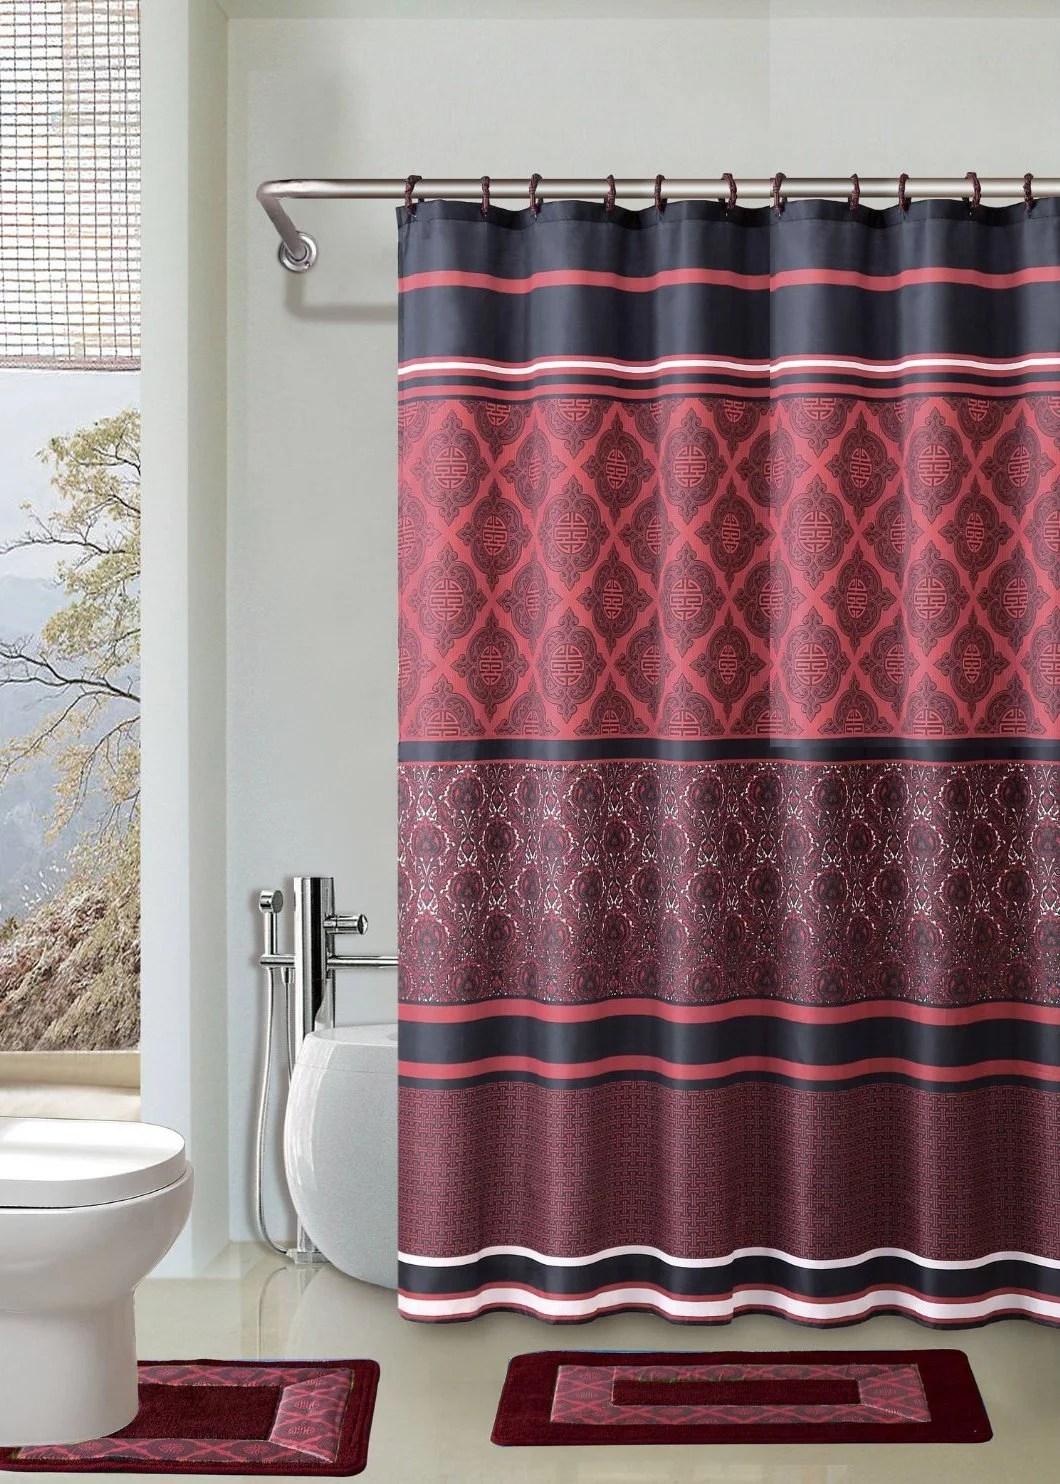 crimson red black 15 piece bathroom accessory set 2 bath mats shower curtain 12 fabric covered rings